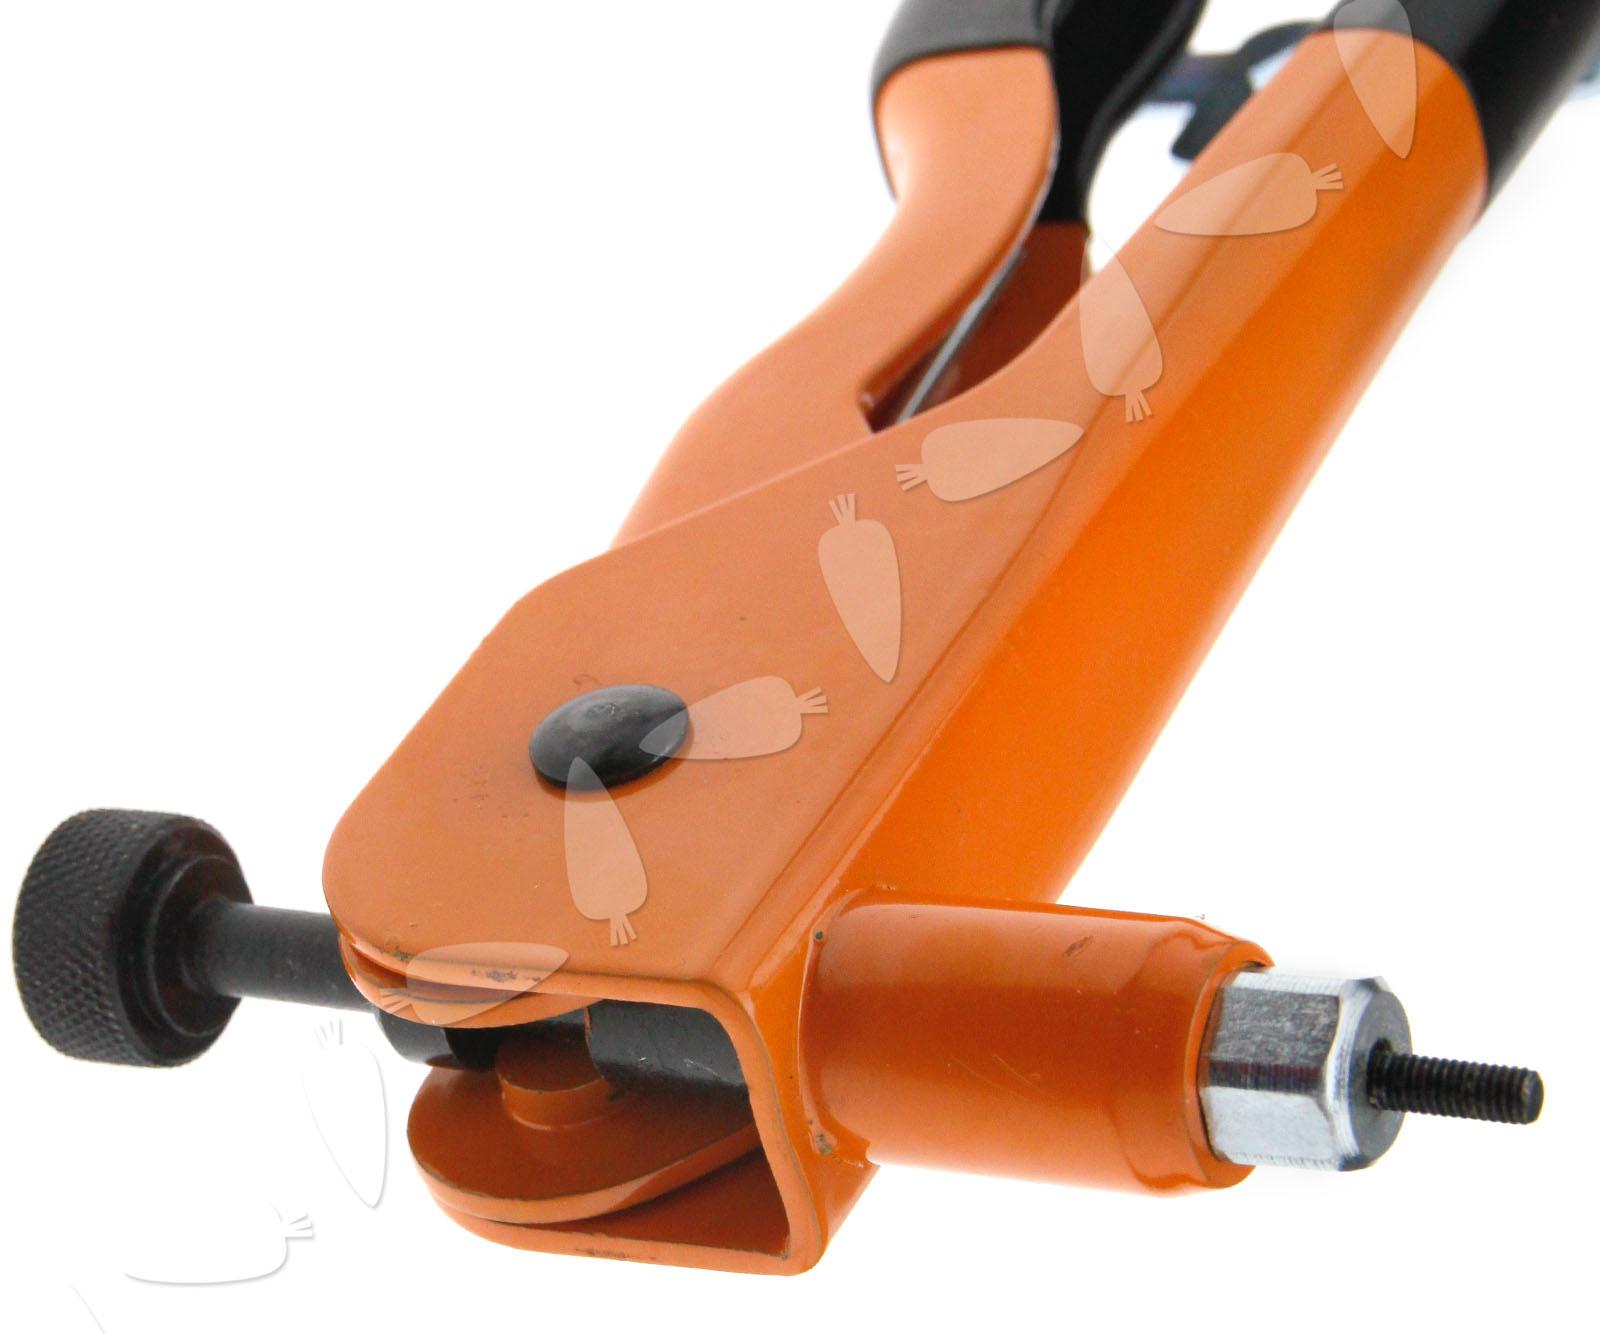 Steel Rivet Tool : New nutsert threaded rivet nut rivnut setting tool riveter